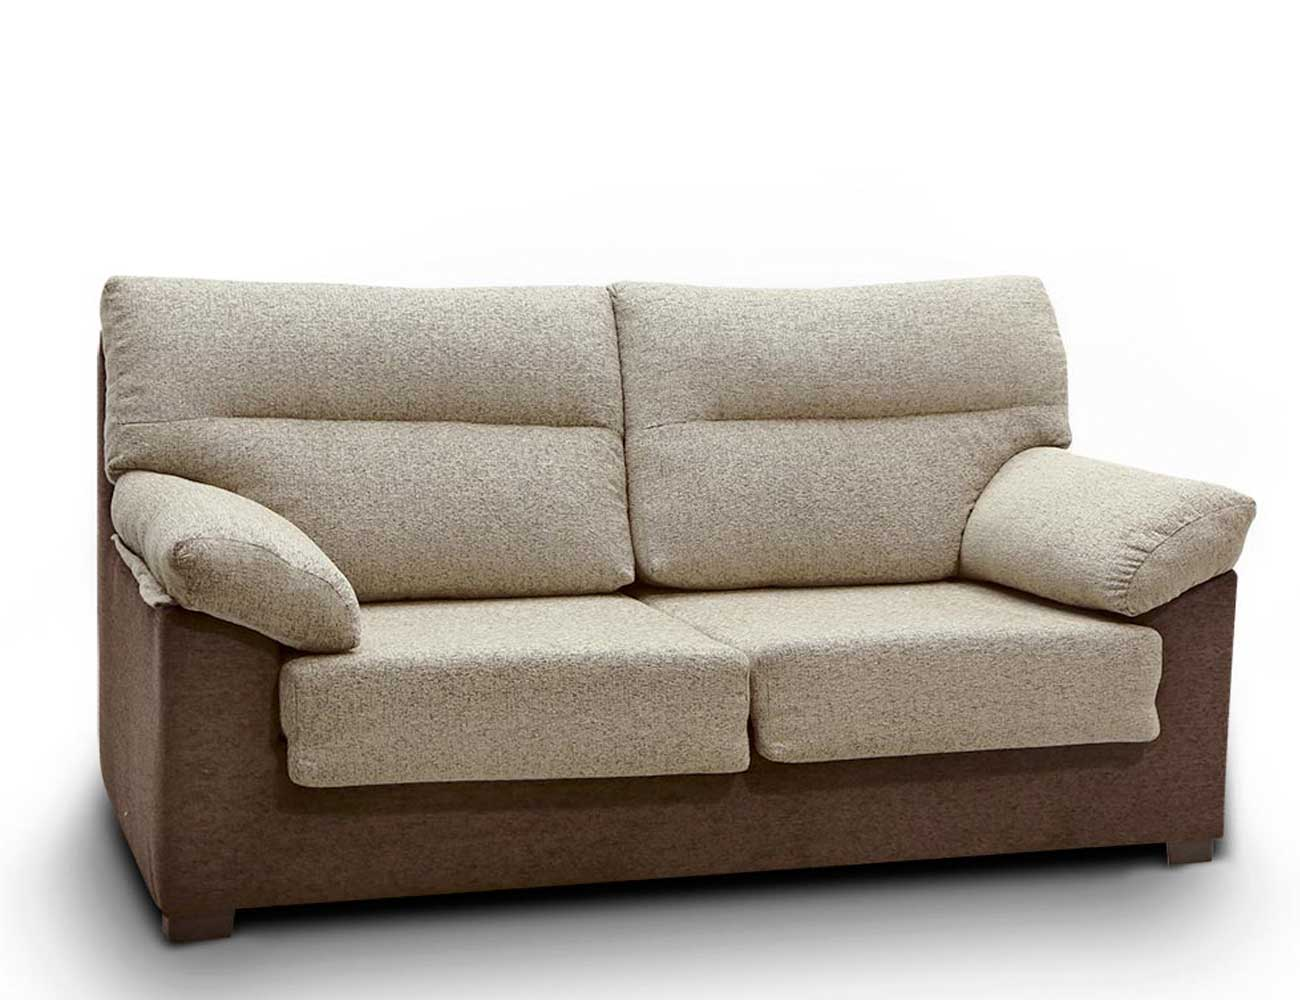 Sofa 3 plazas barato2